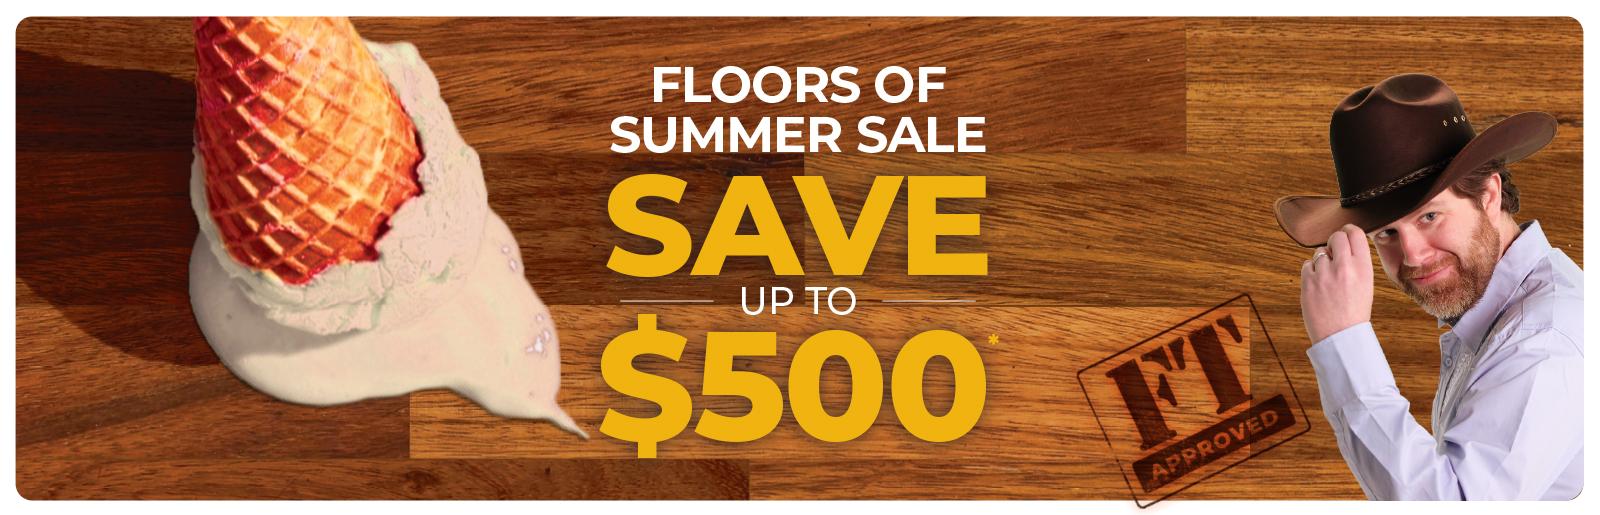 Flooring Oklahoma The Floor Trader Of Oklahoma - Budget floor store okc